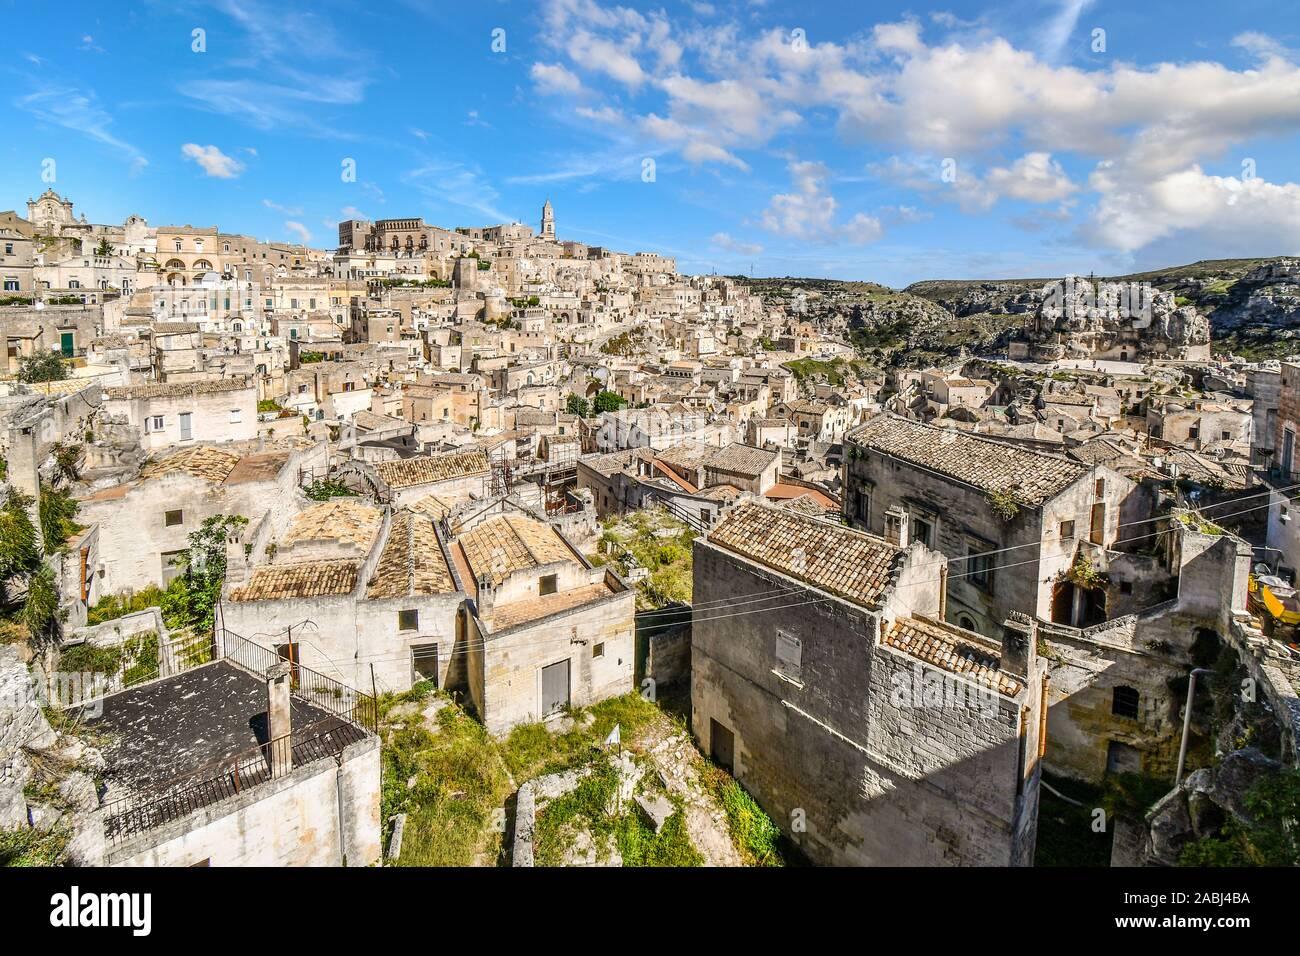 Panoramic shot of the sassi caves, ancient Madonna de Idris rock church, Matera Cathedral and the city of Matera, Italy, in the Basilicata Region. Stock Photo